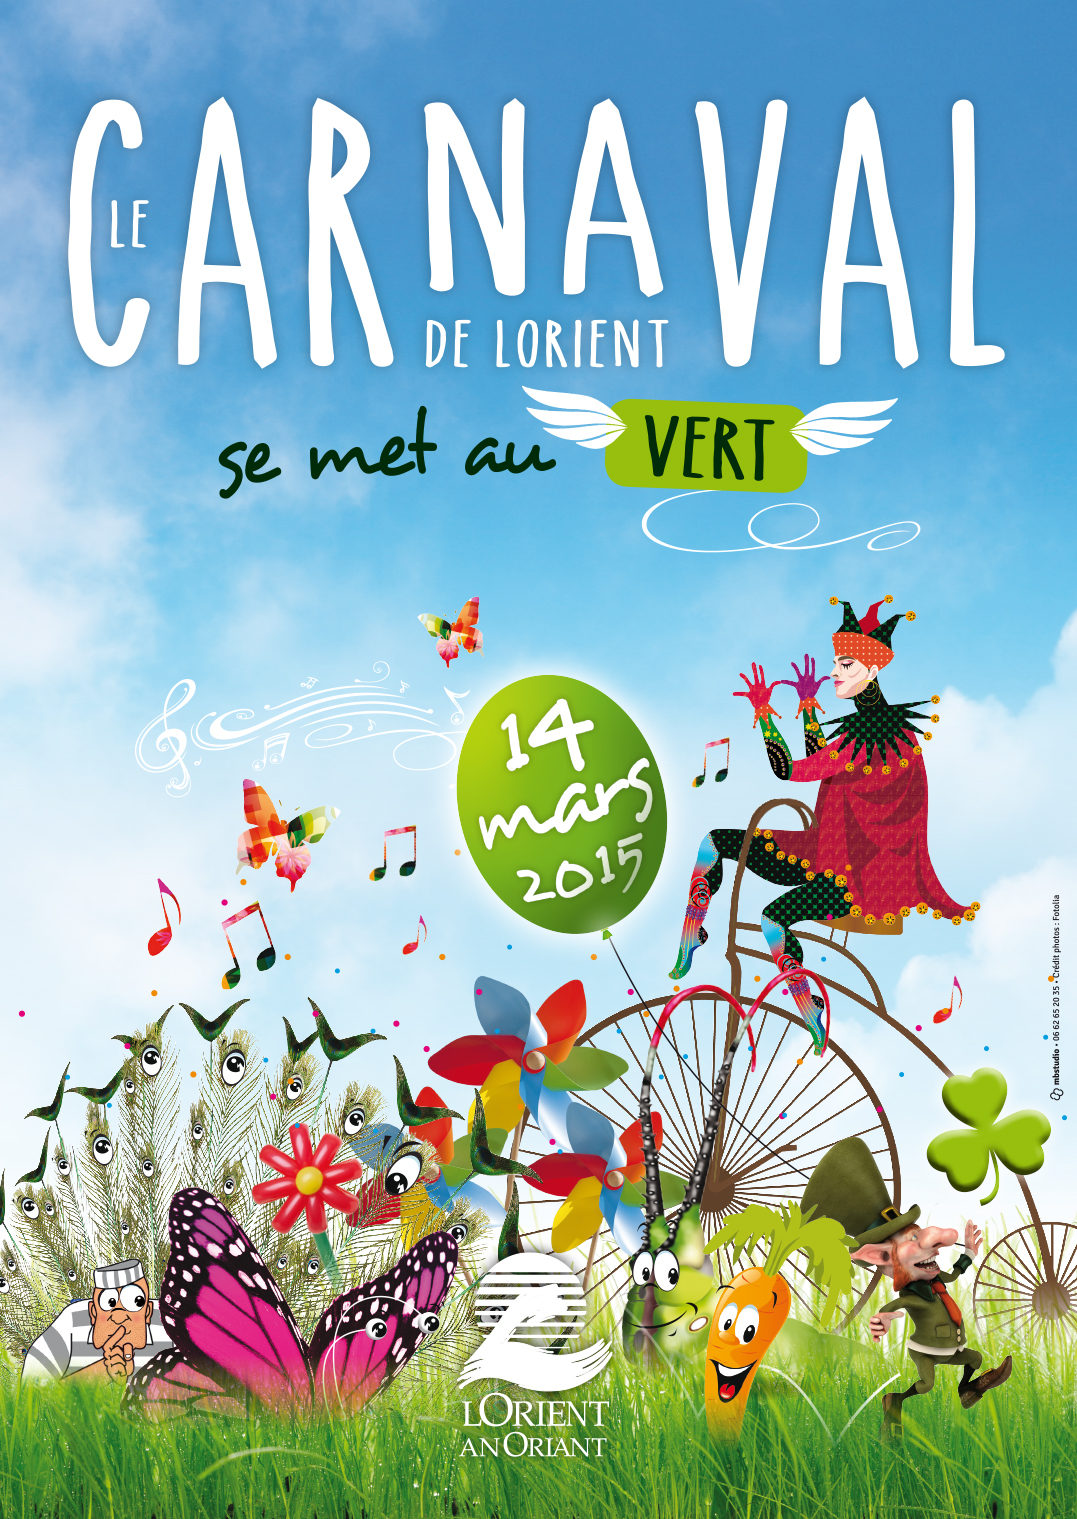 AF_CarnavalLorient.jpg